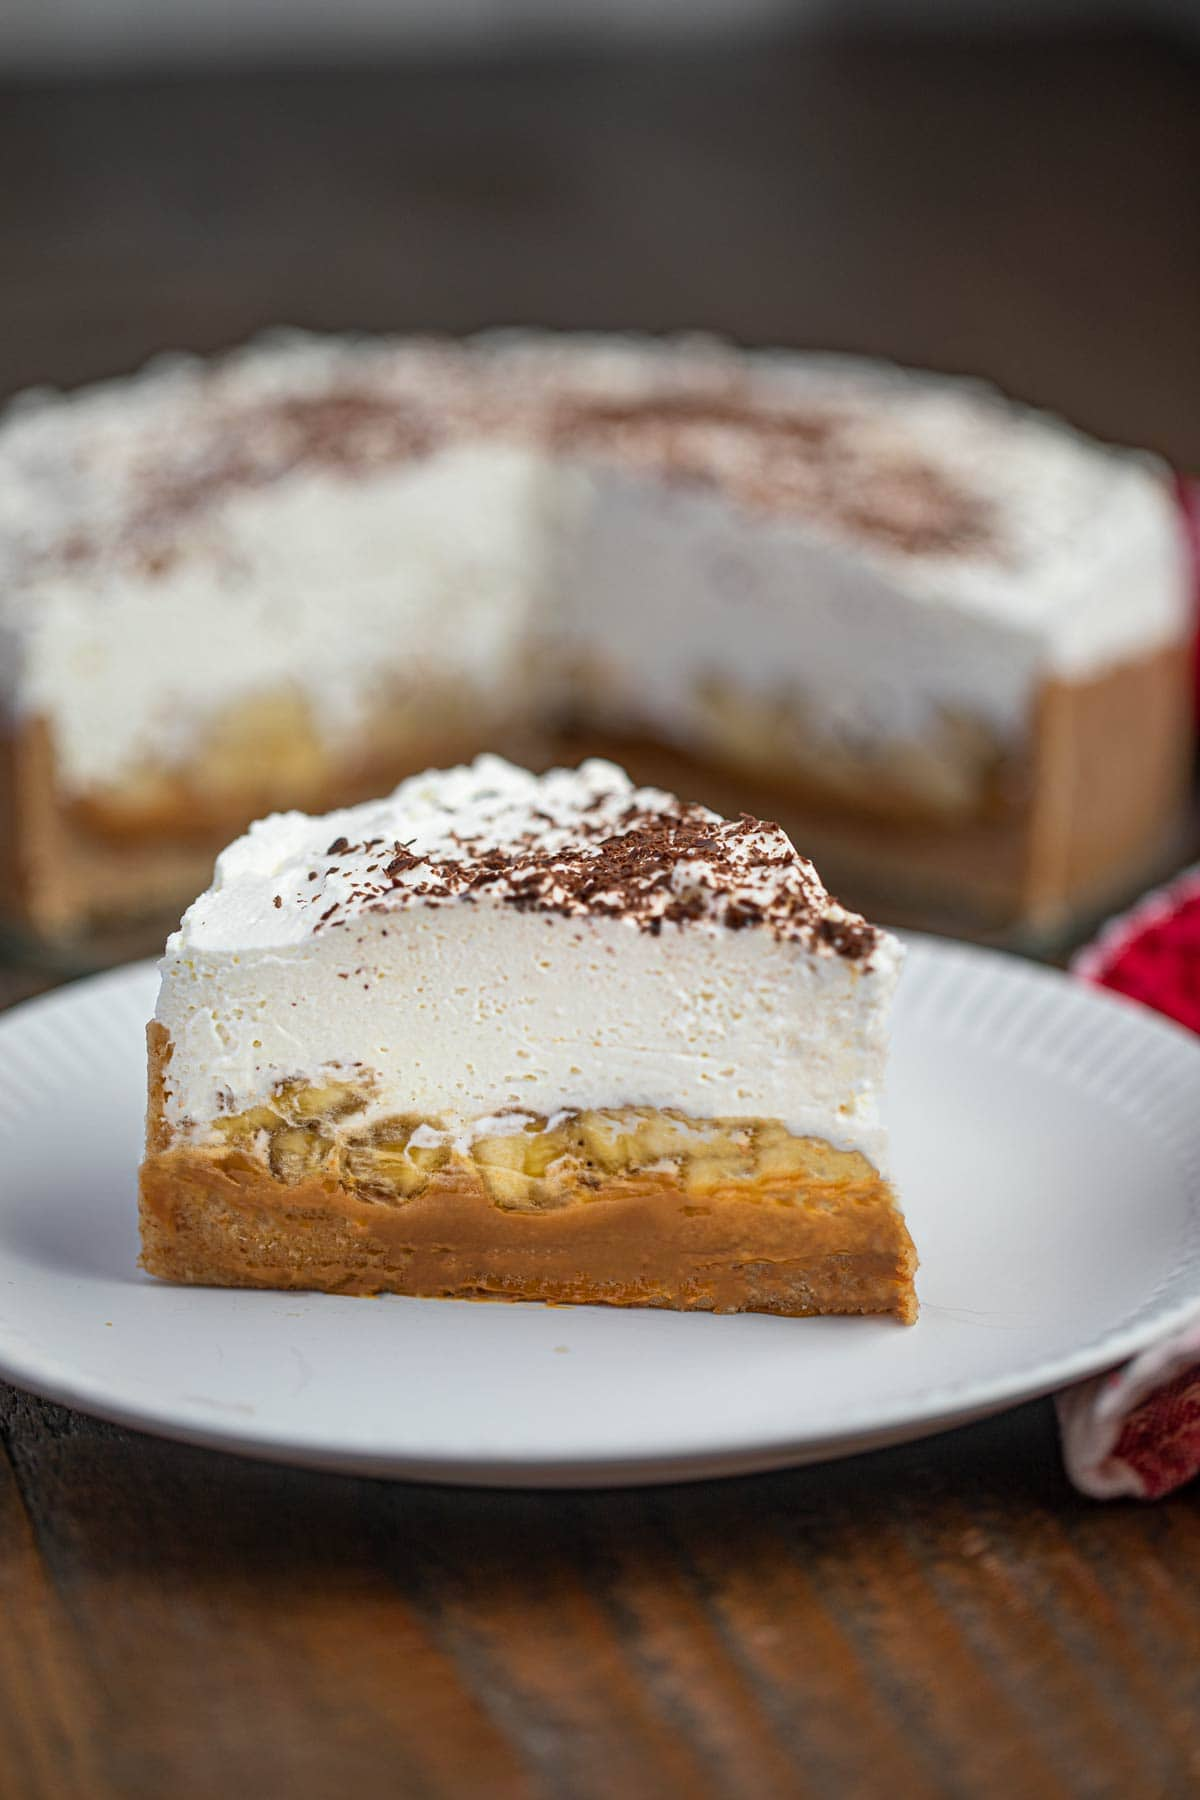 Banoffee Pie on plate